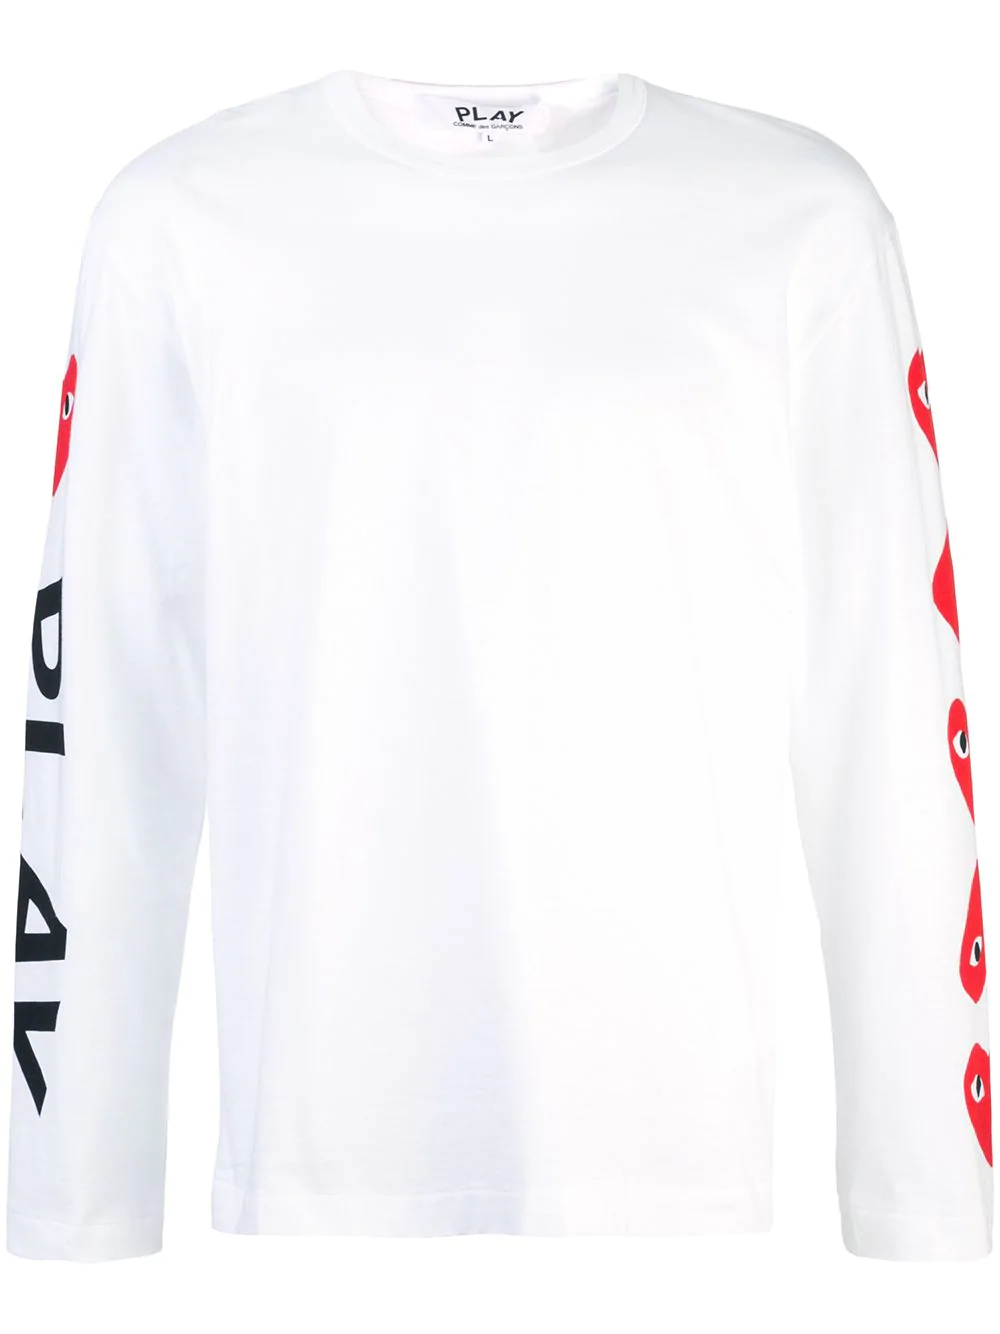 6aae96bced55c1 Comme Des GarÇOns Play Almond-Eye Long-Sleeved T-Shirt - White ...